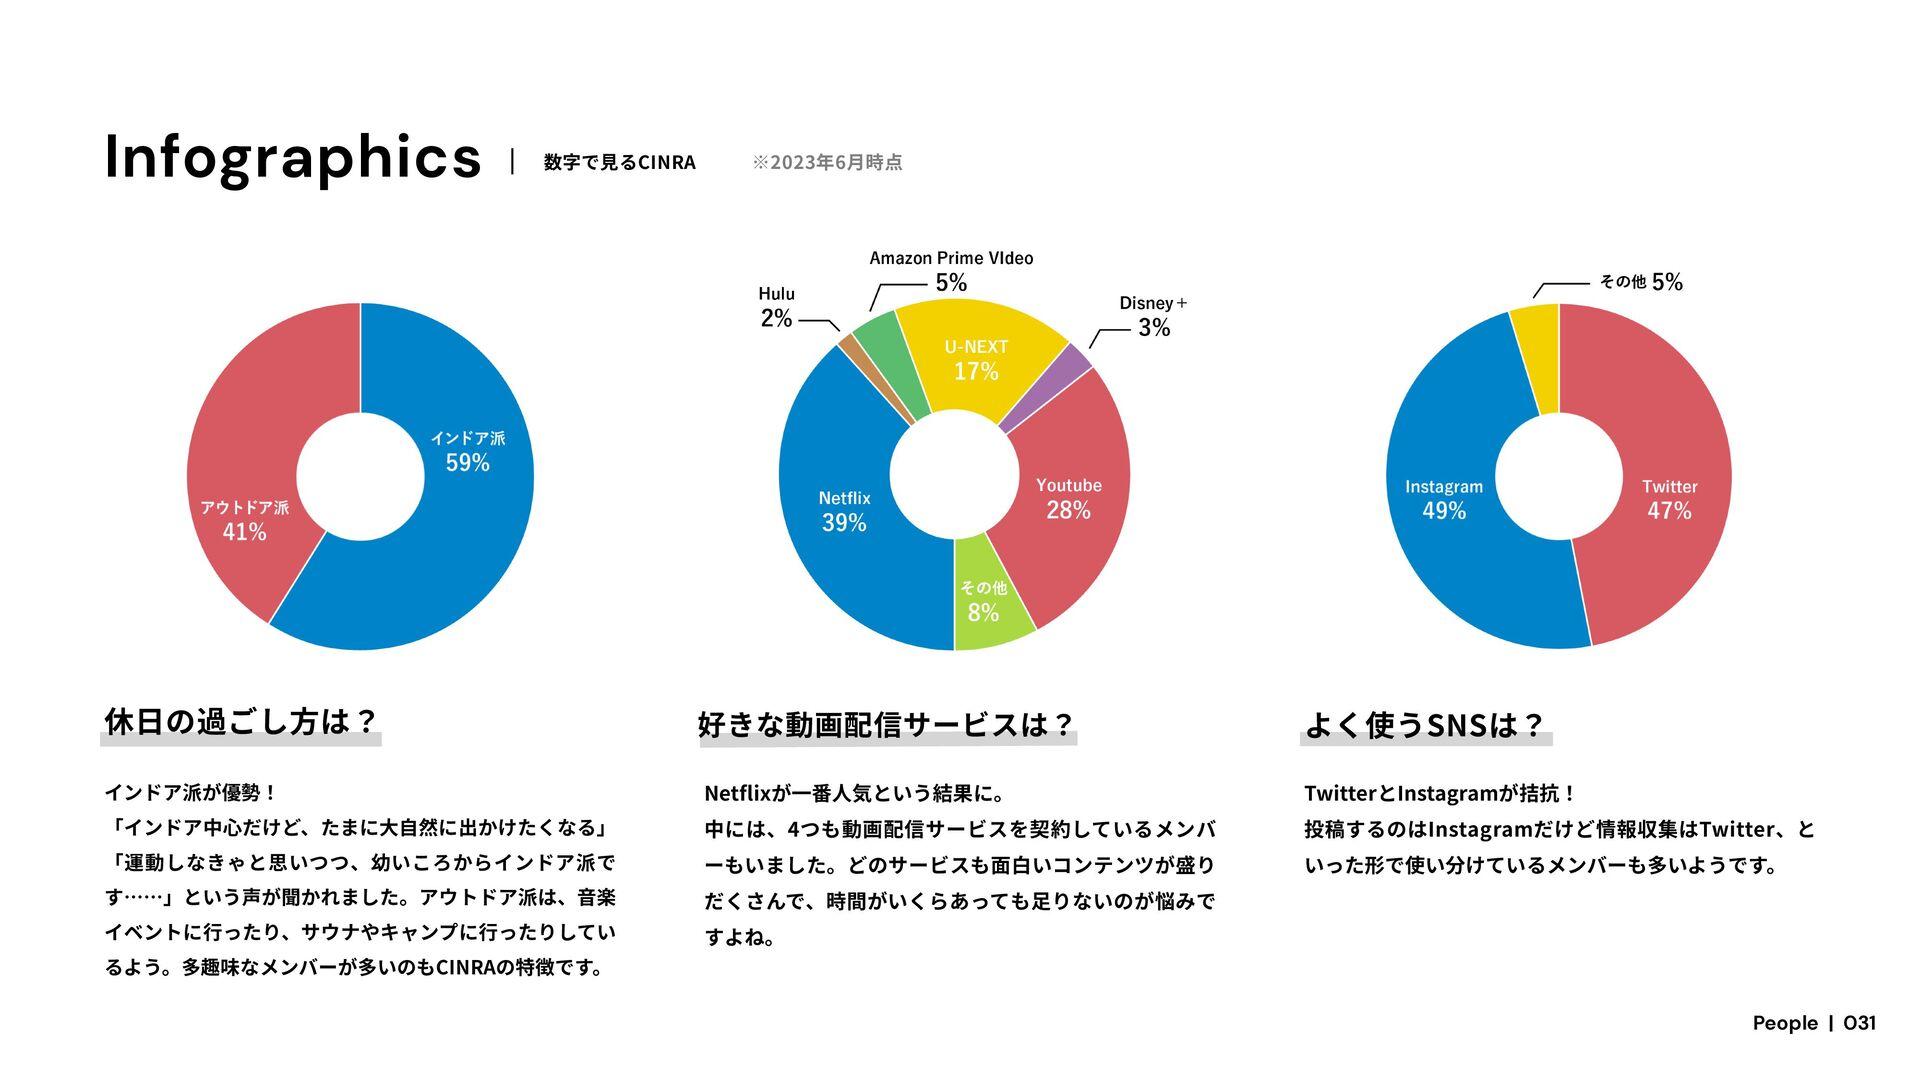 "Infographics People | 031 $*/3""Ұ൪ͷେॴଳ0XOFSTIJQ..."